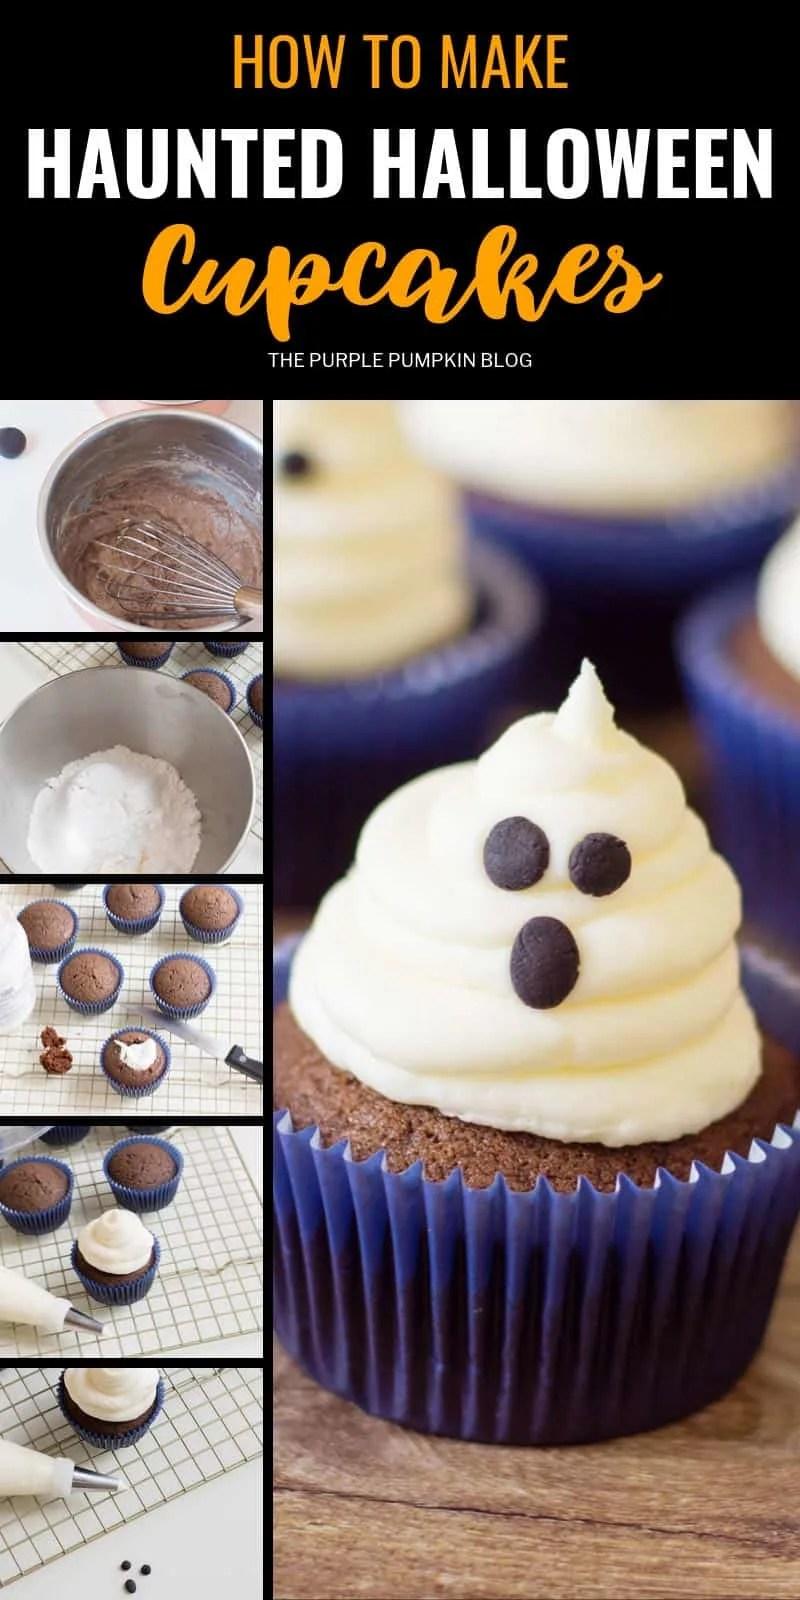 How to make haunted Halloween cupcakes